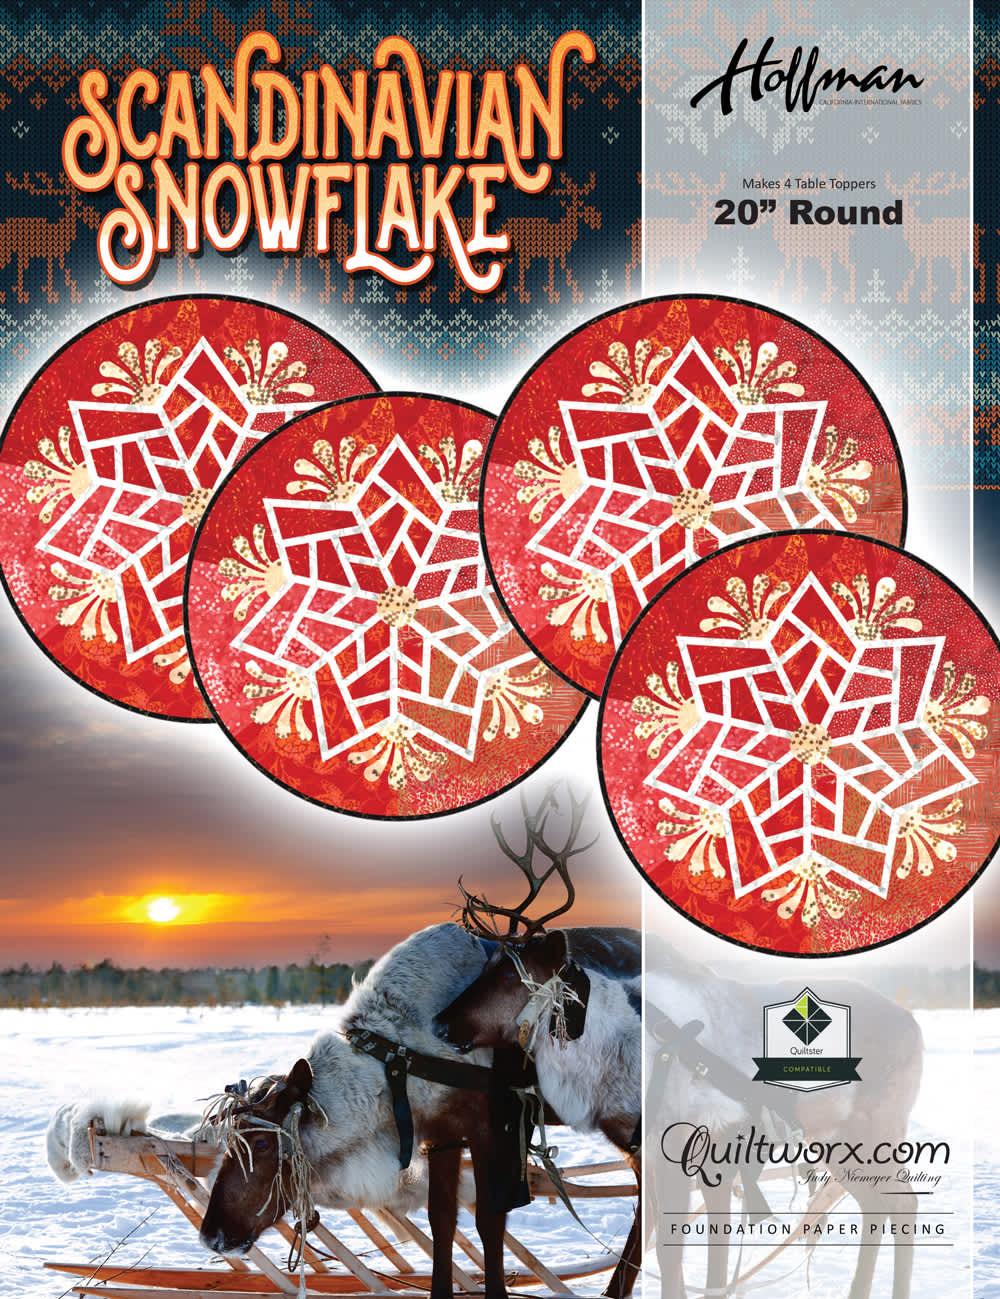 Scandinavian Snowflake